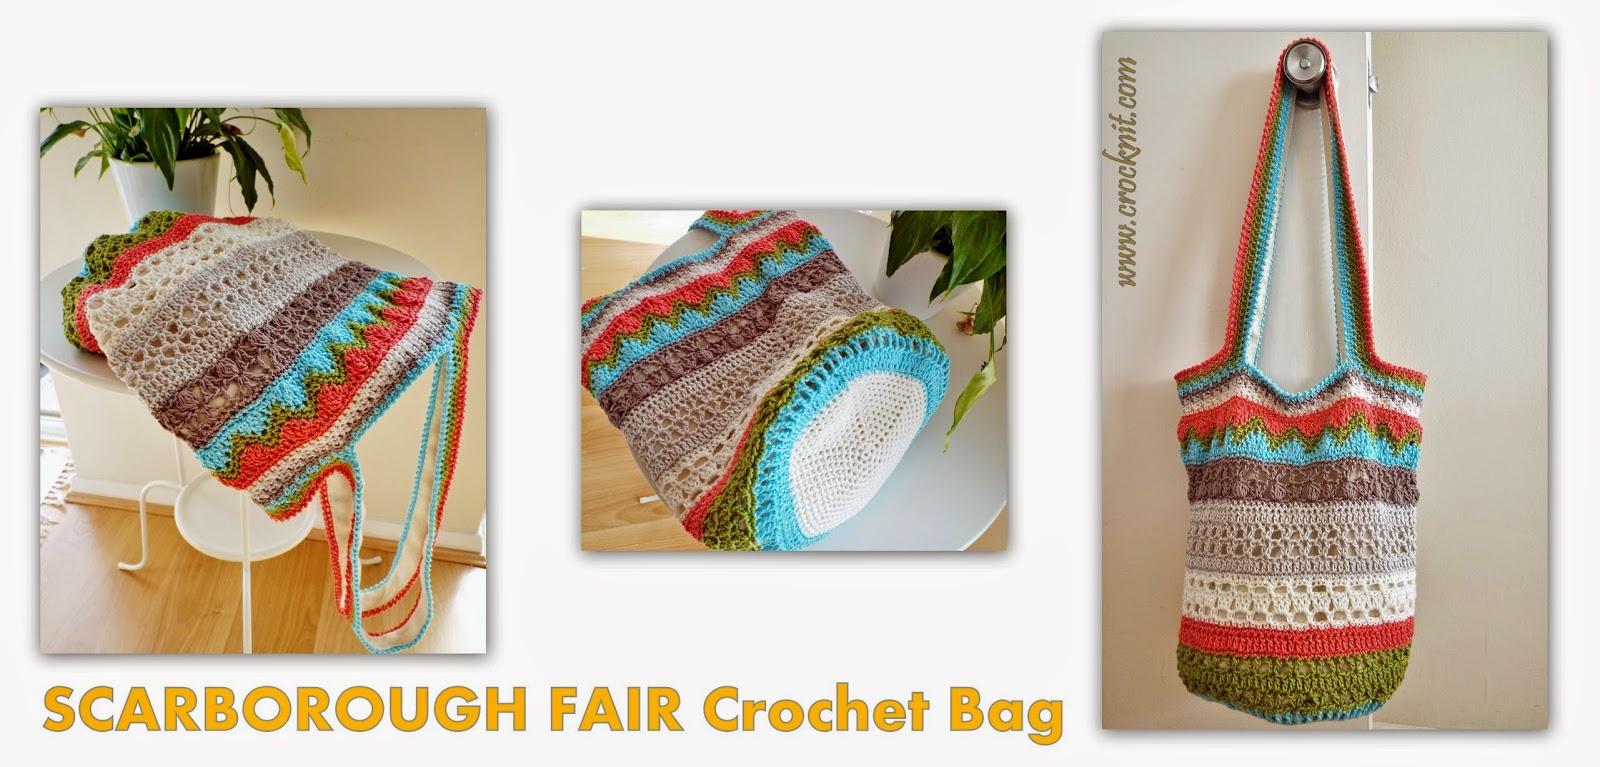 SCARBOROUGH FAIR Crochet Bag